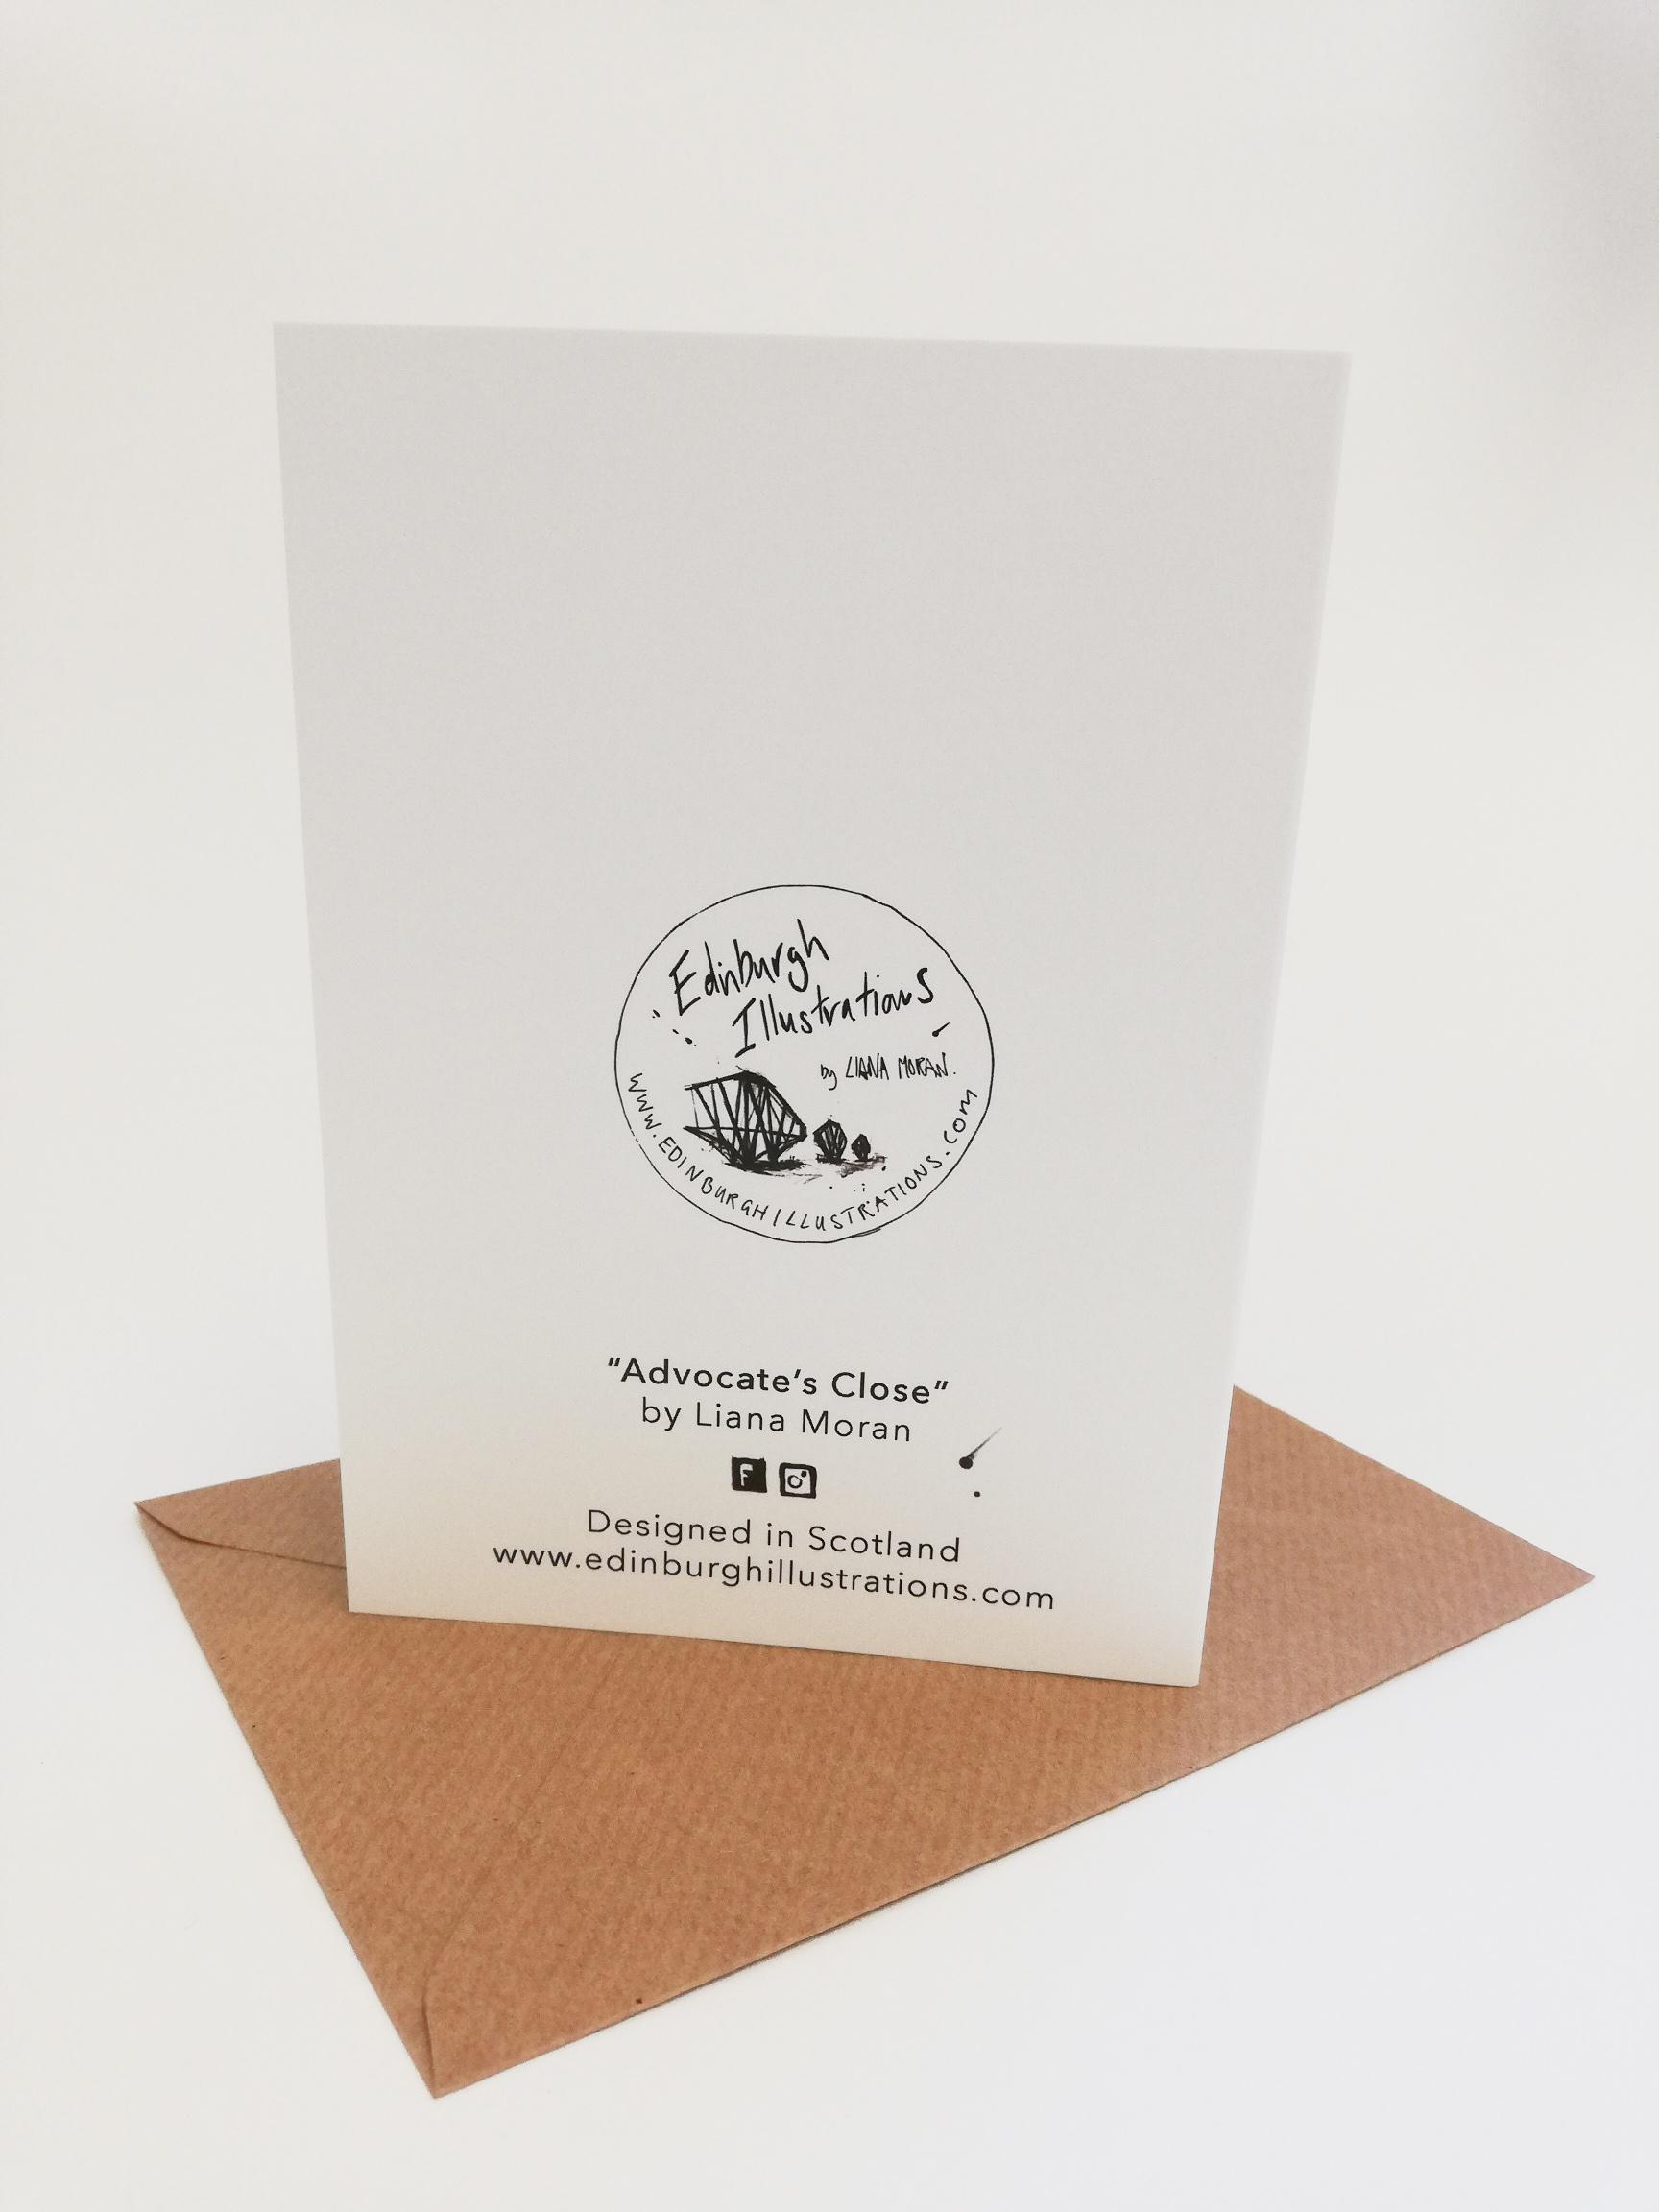 Advocates Close card